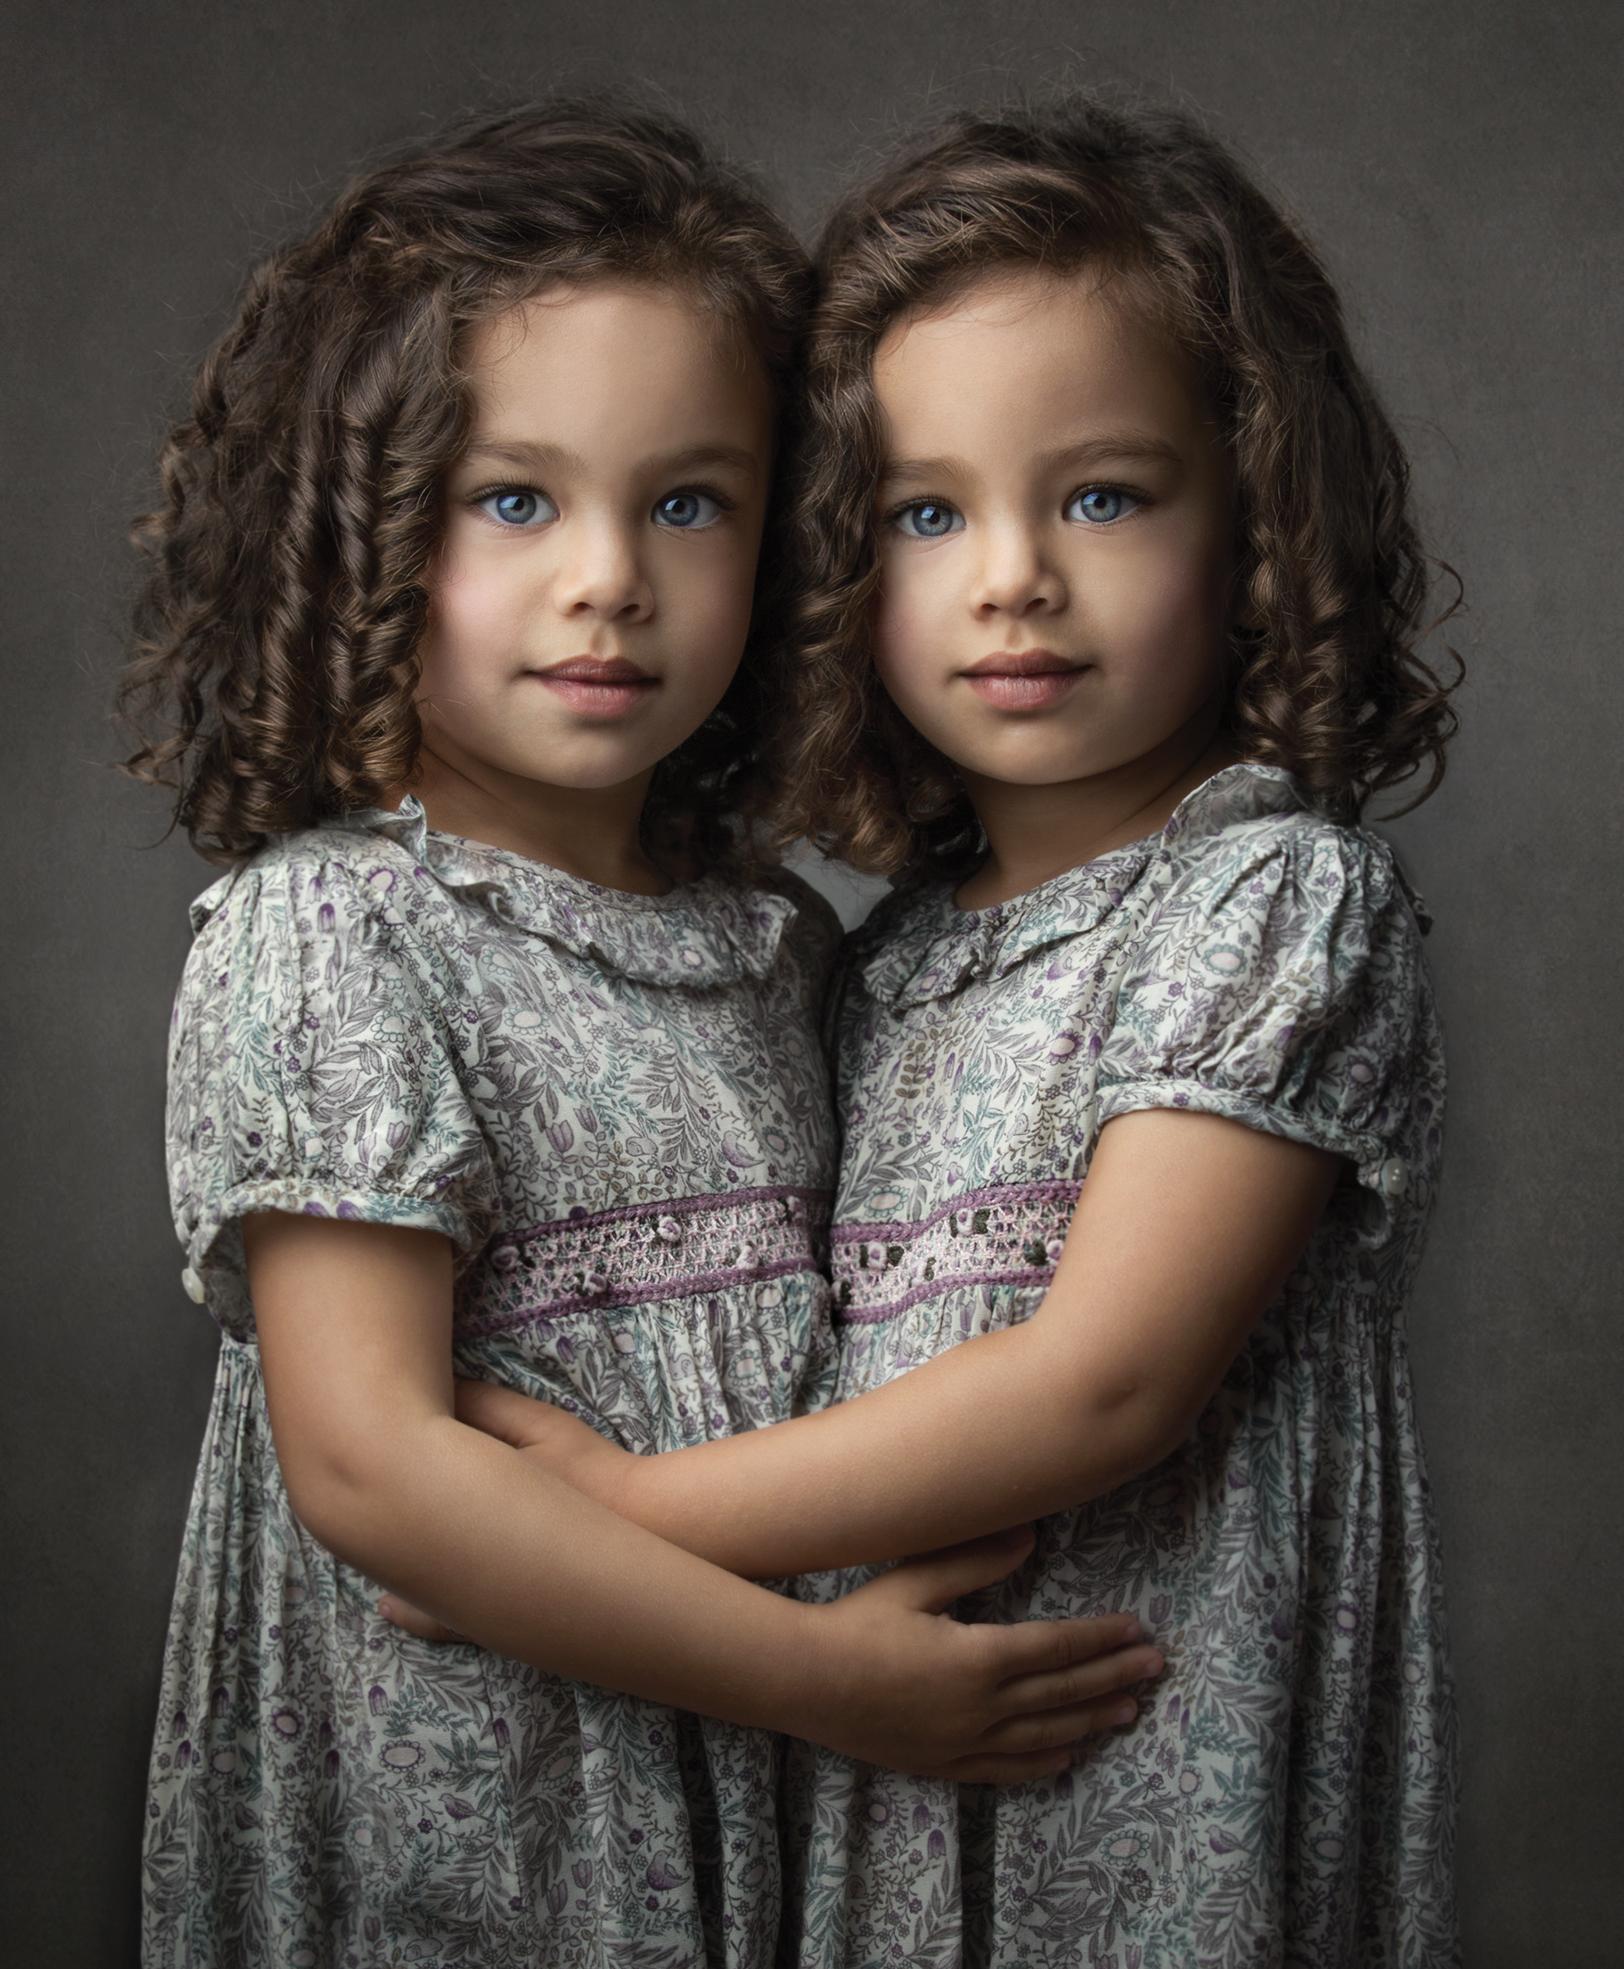 FIne-Art-Child-Portraits-9.jpg